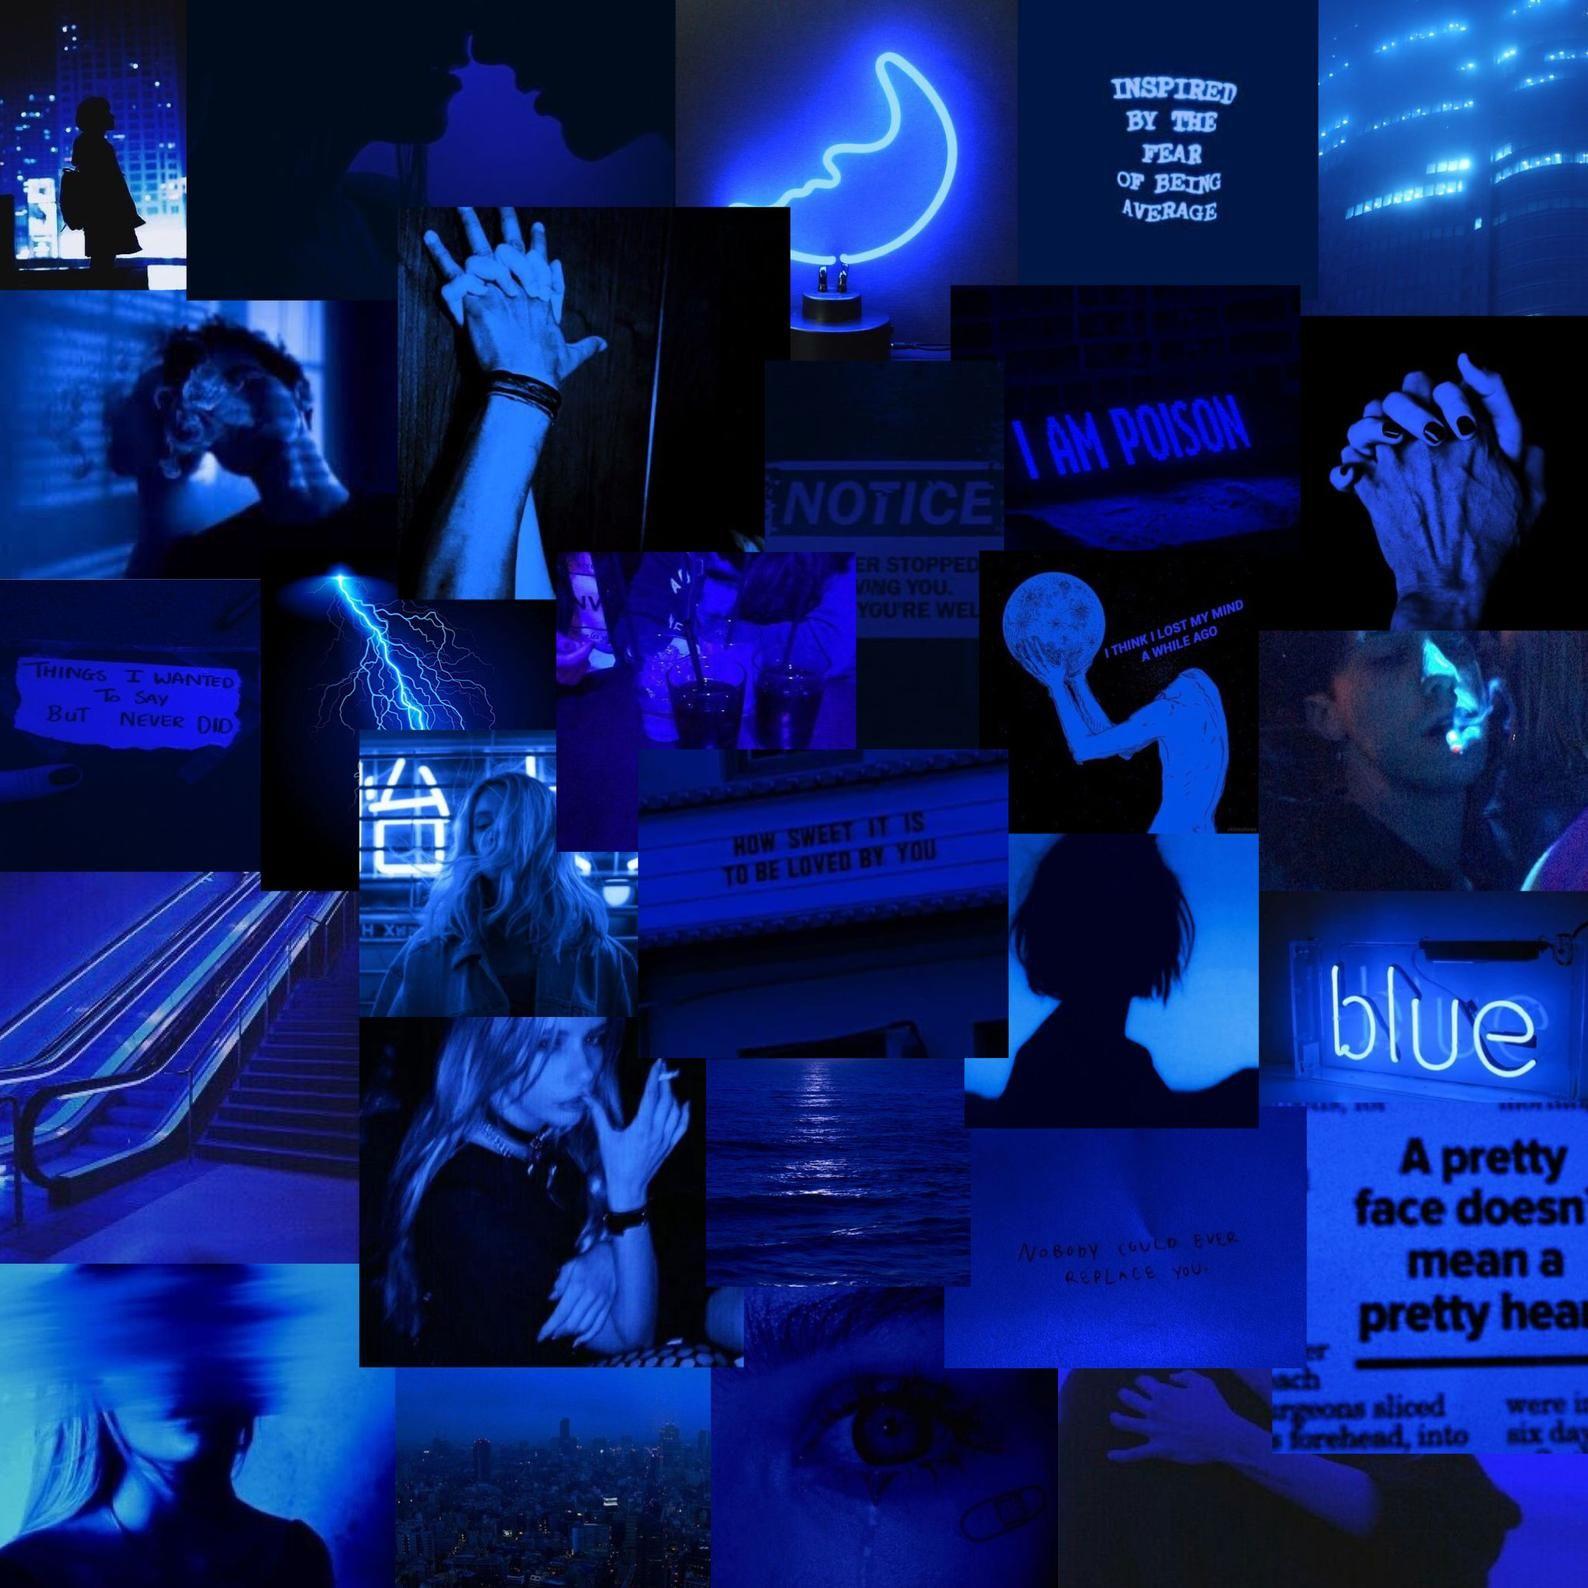 Dark Blue Grunge Vsco Digital Wall Collage 55 Pcs Blue Aesthetic Dark Light Blue Aesthetic Blue Aesthetic Grunge